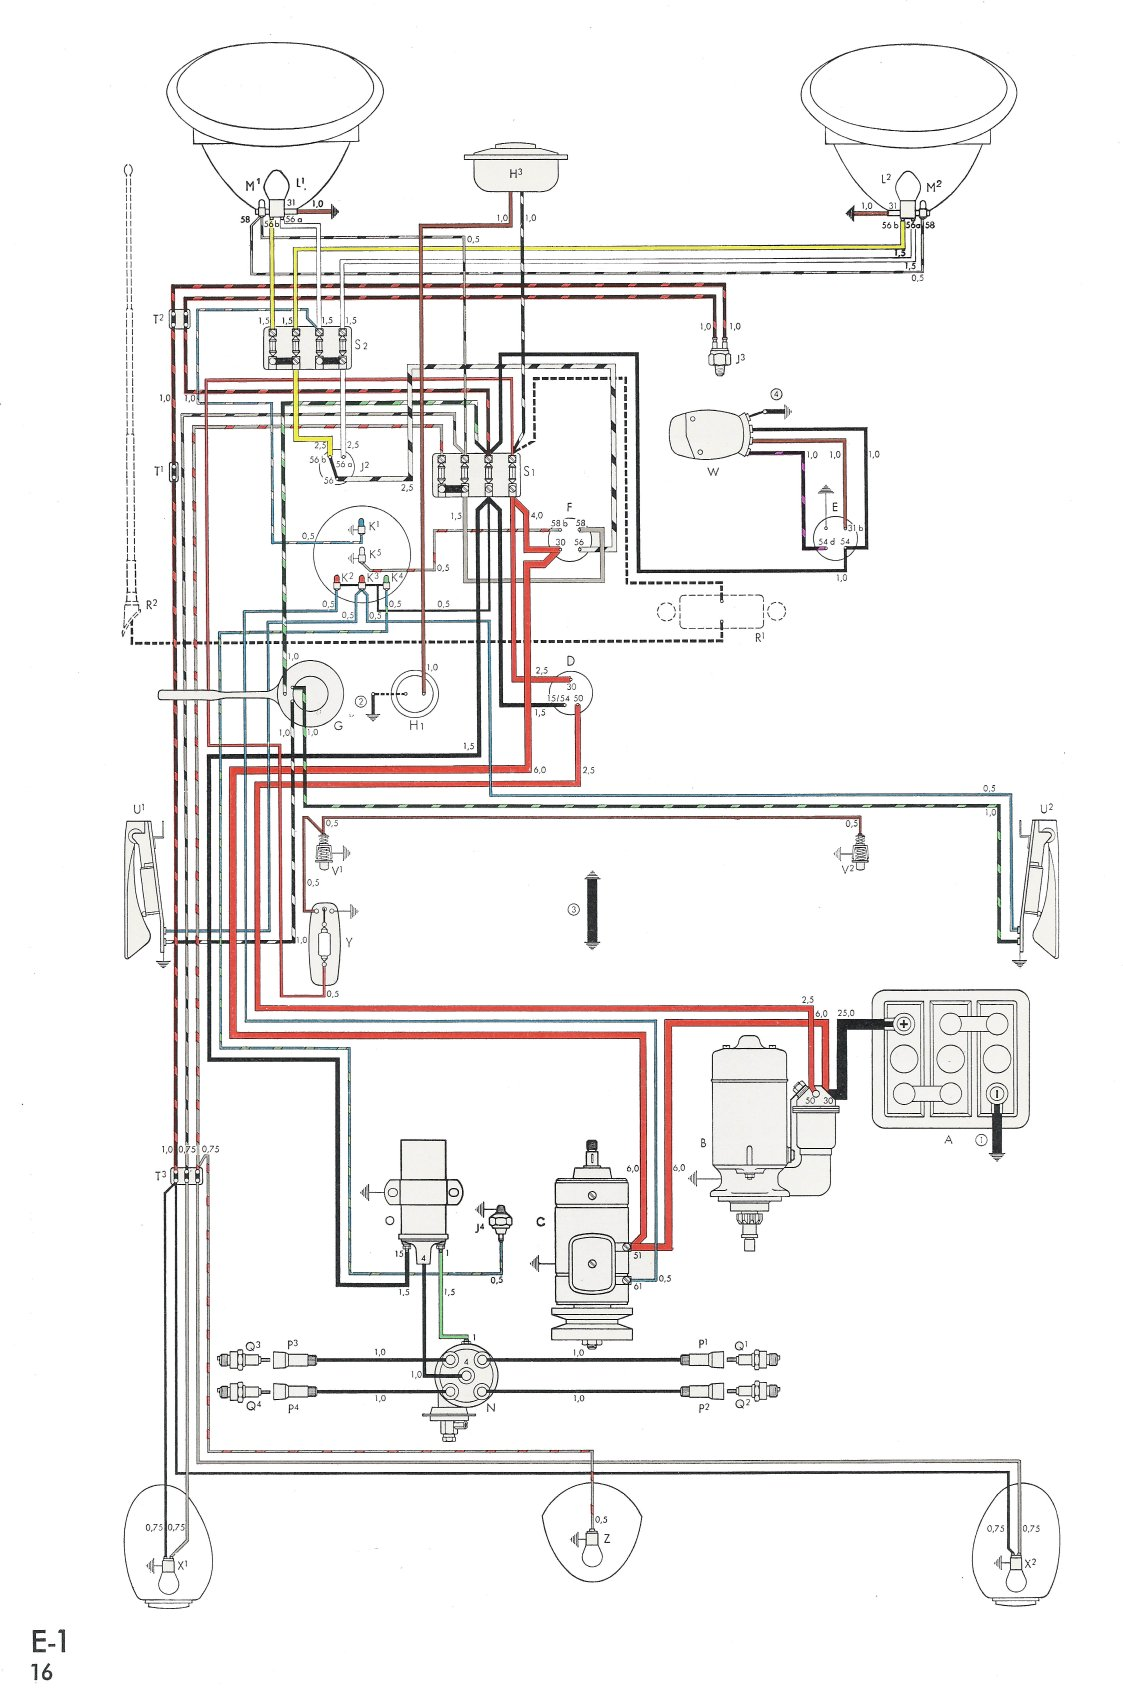 1971 vw beetle turn signal wiring diagram golf stereo thesamba com type 1 diagrams